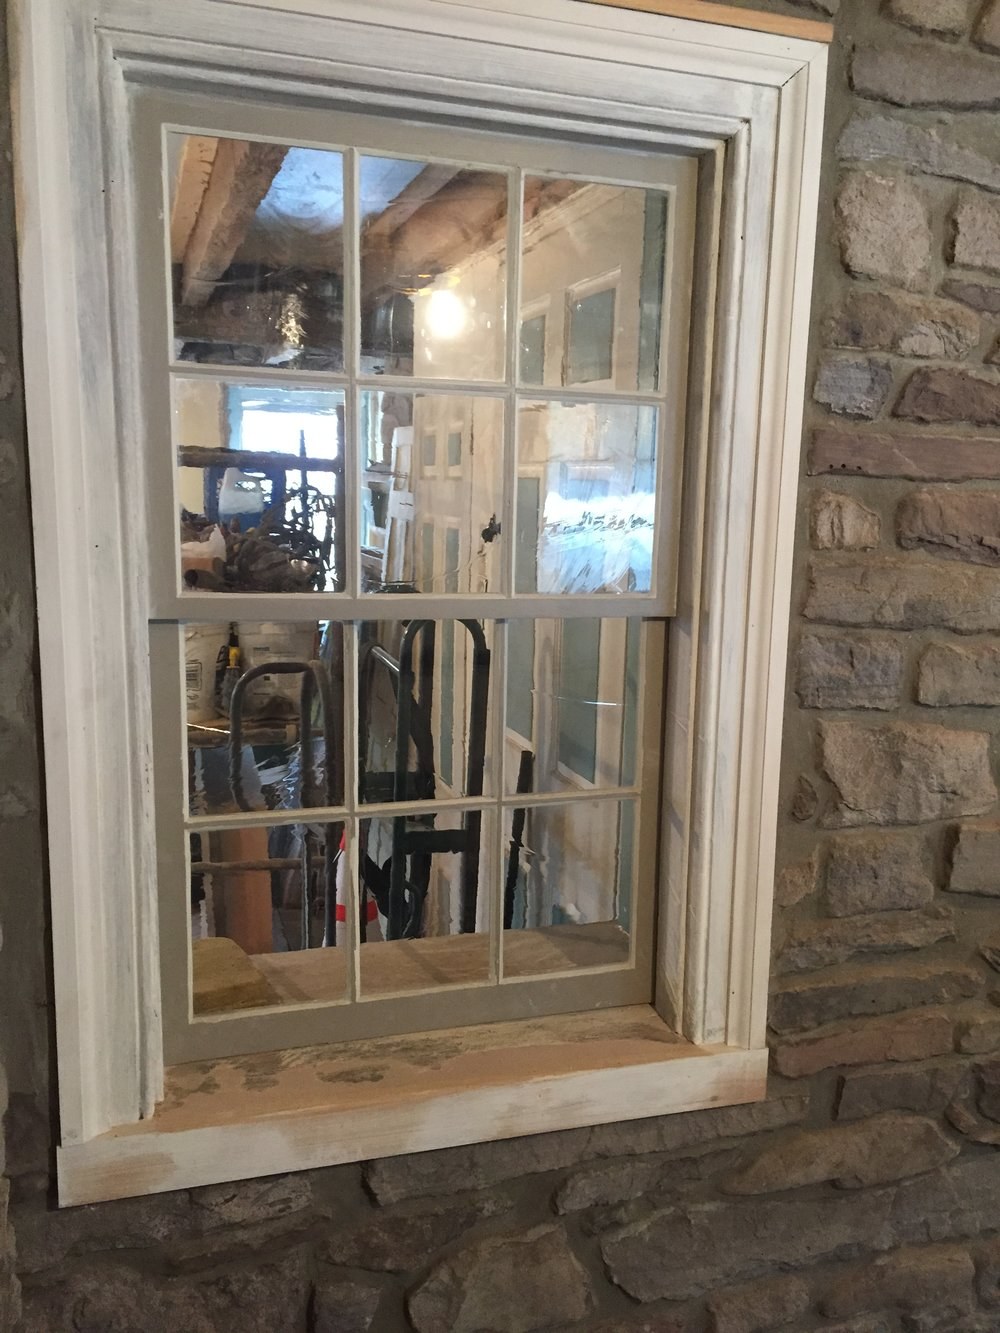 terri feralio - historic window restoration.JPG